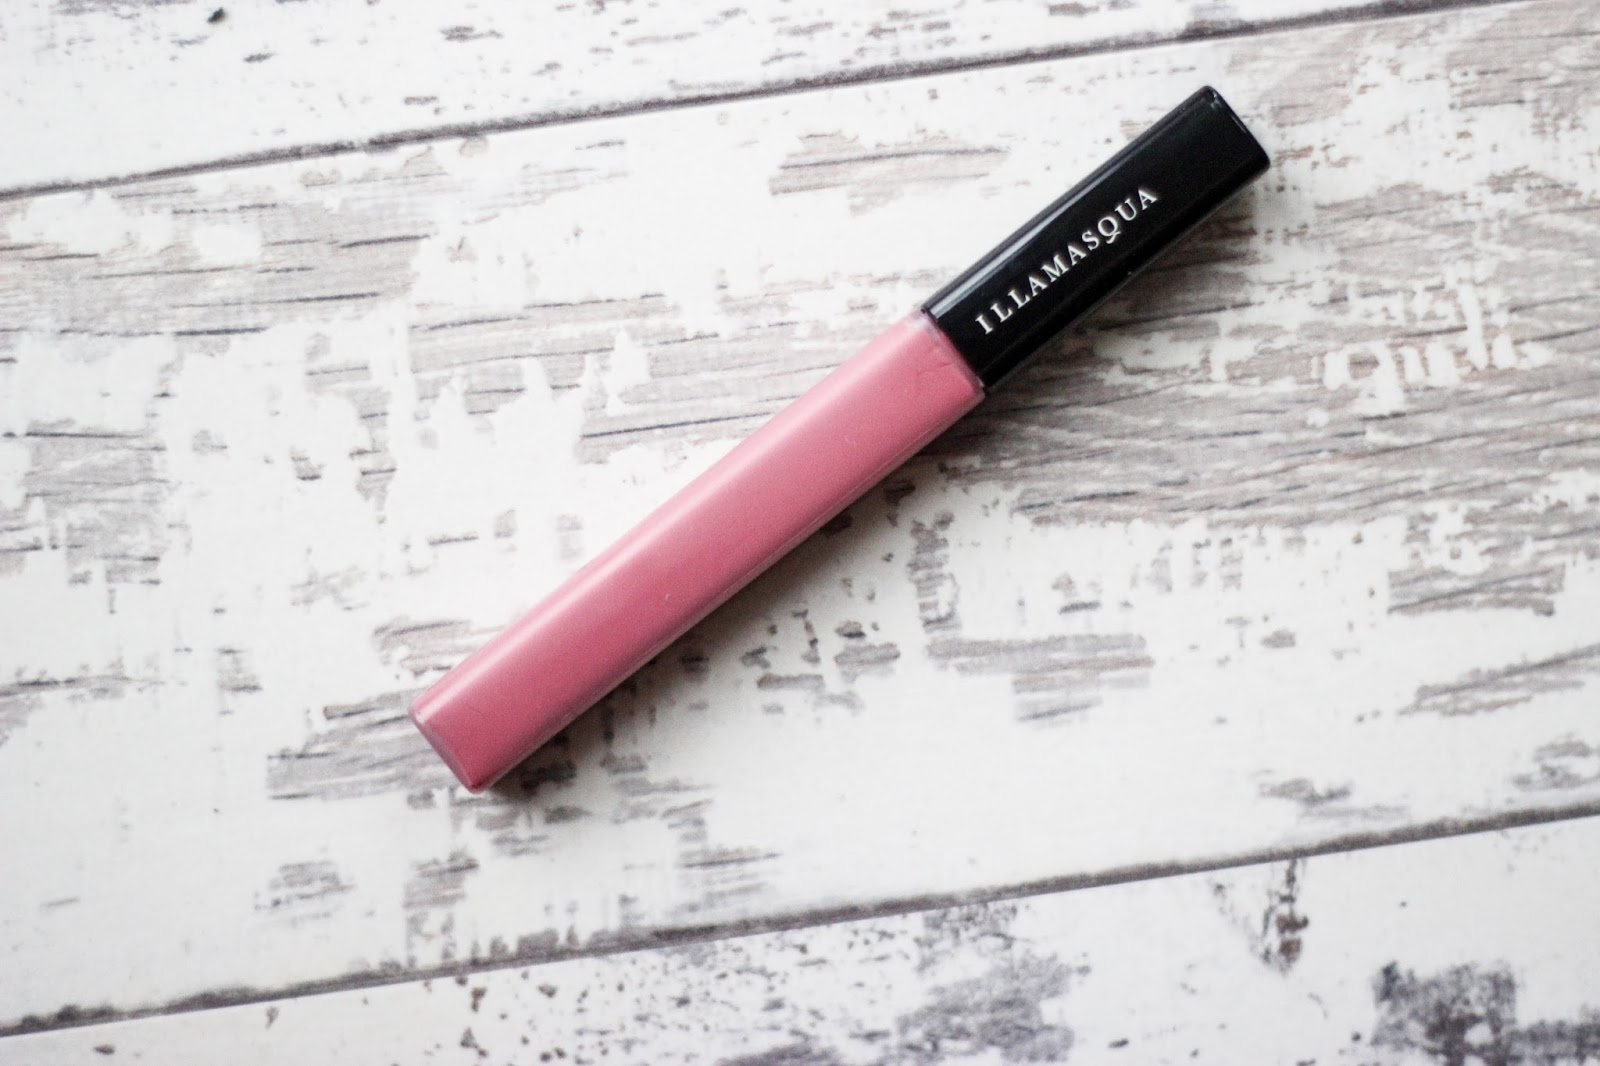 illasmaqua powder foundation 240 330 intense lip gloss move